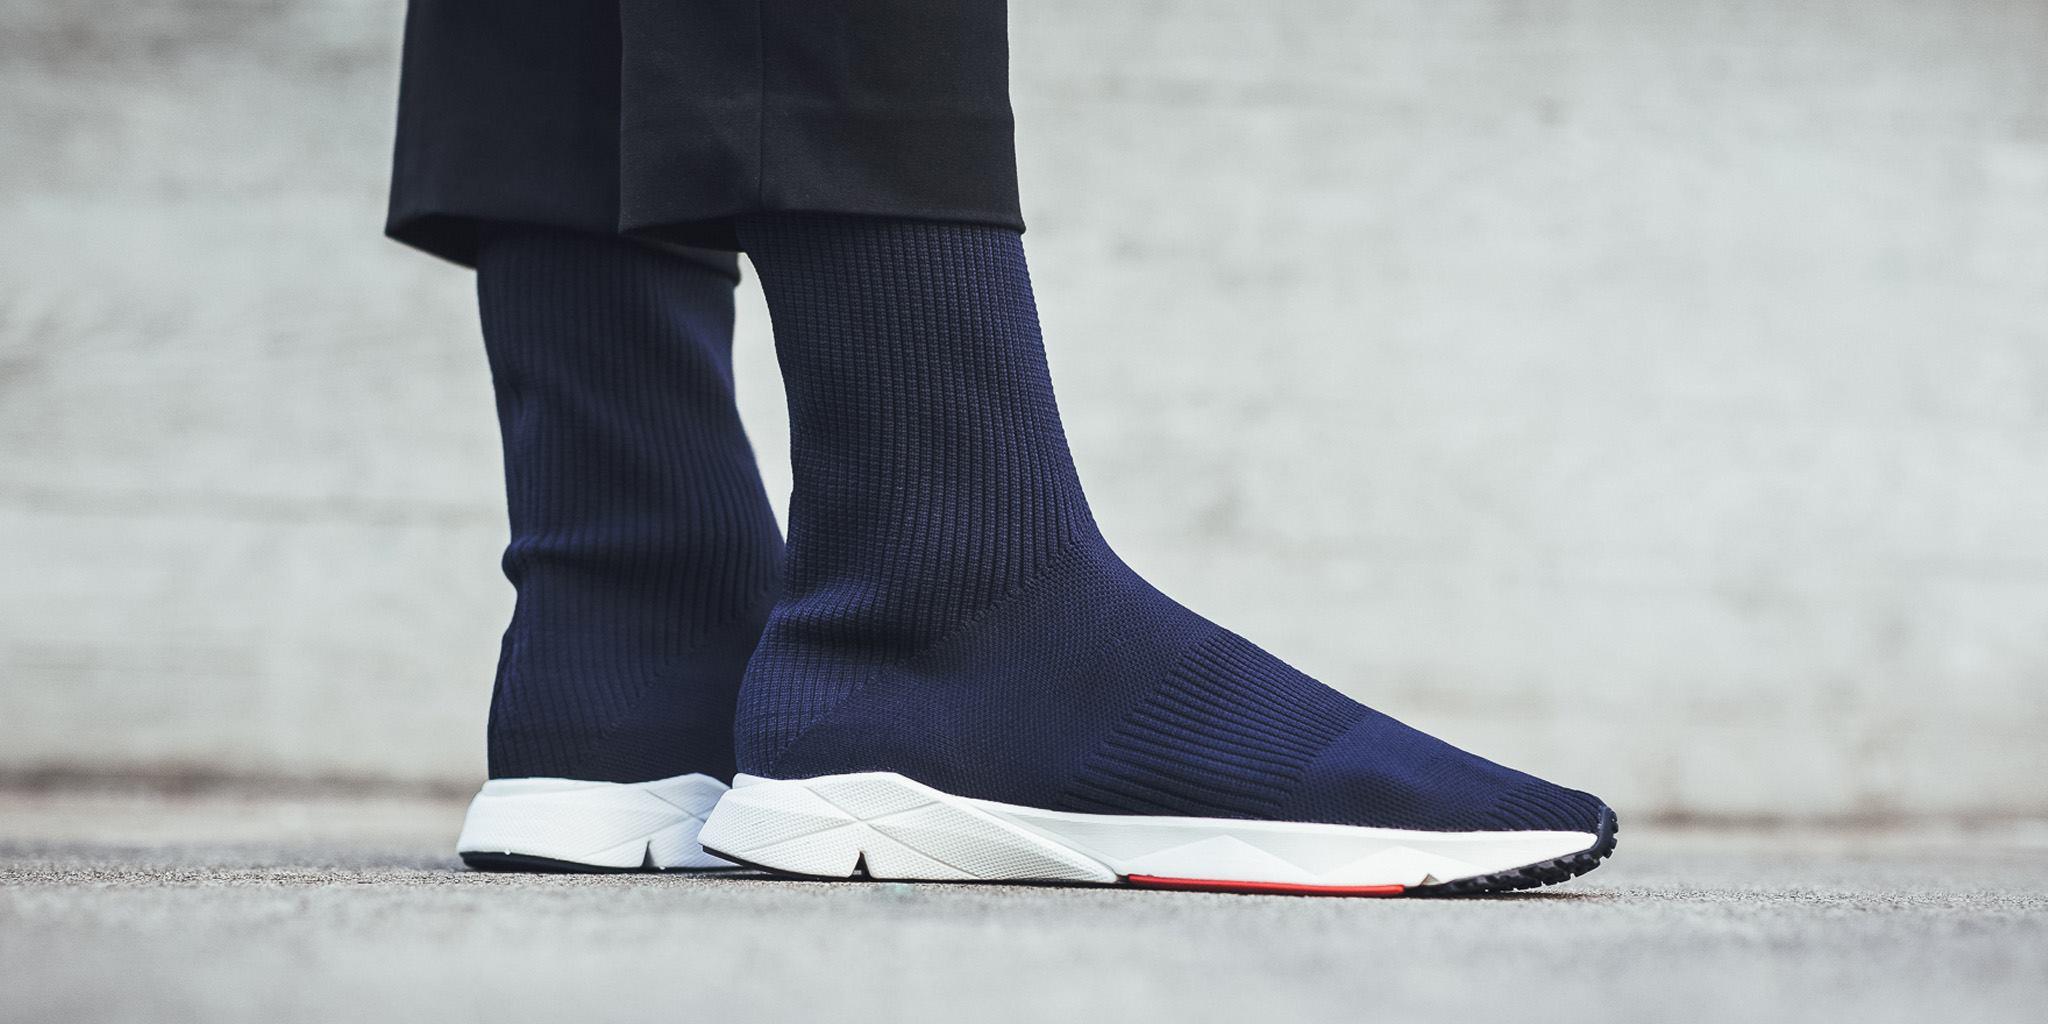 Dispensación Pef sólido  Navy Covers The Latest Reebok Sock Runner UltraKnit • KicksOnFire.com